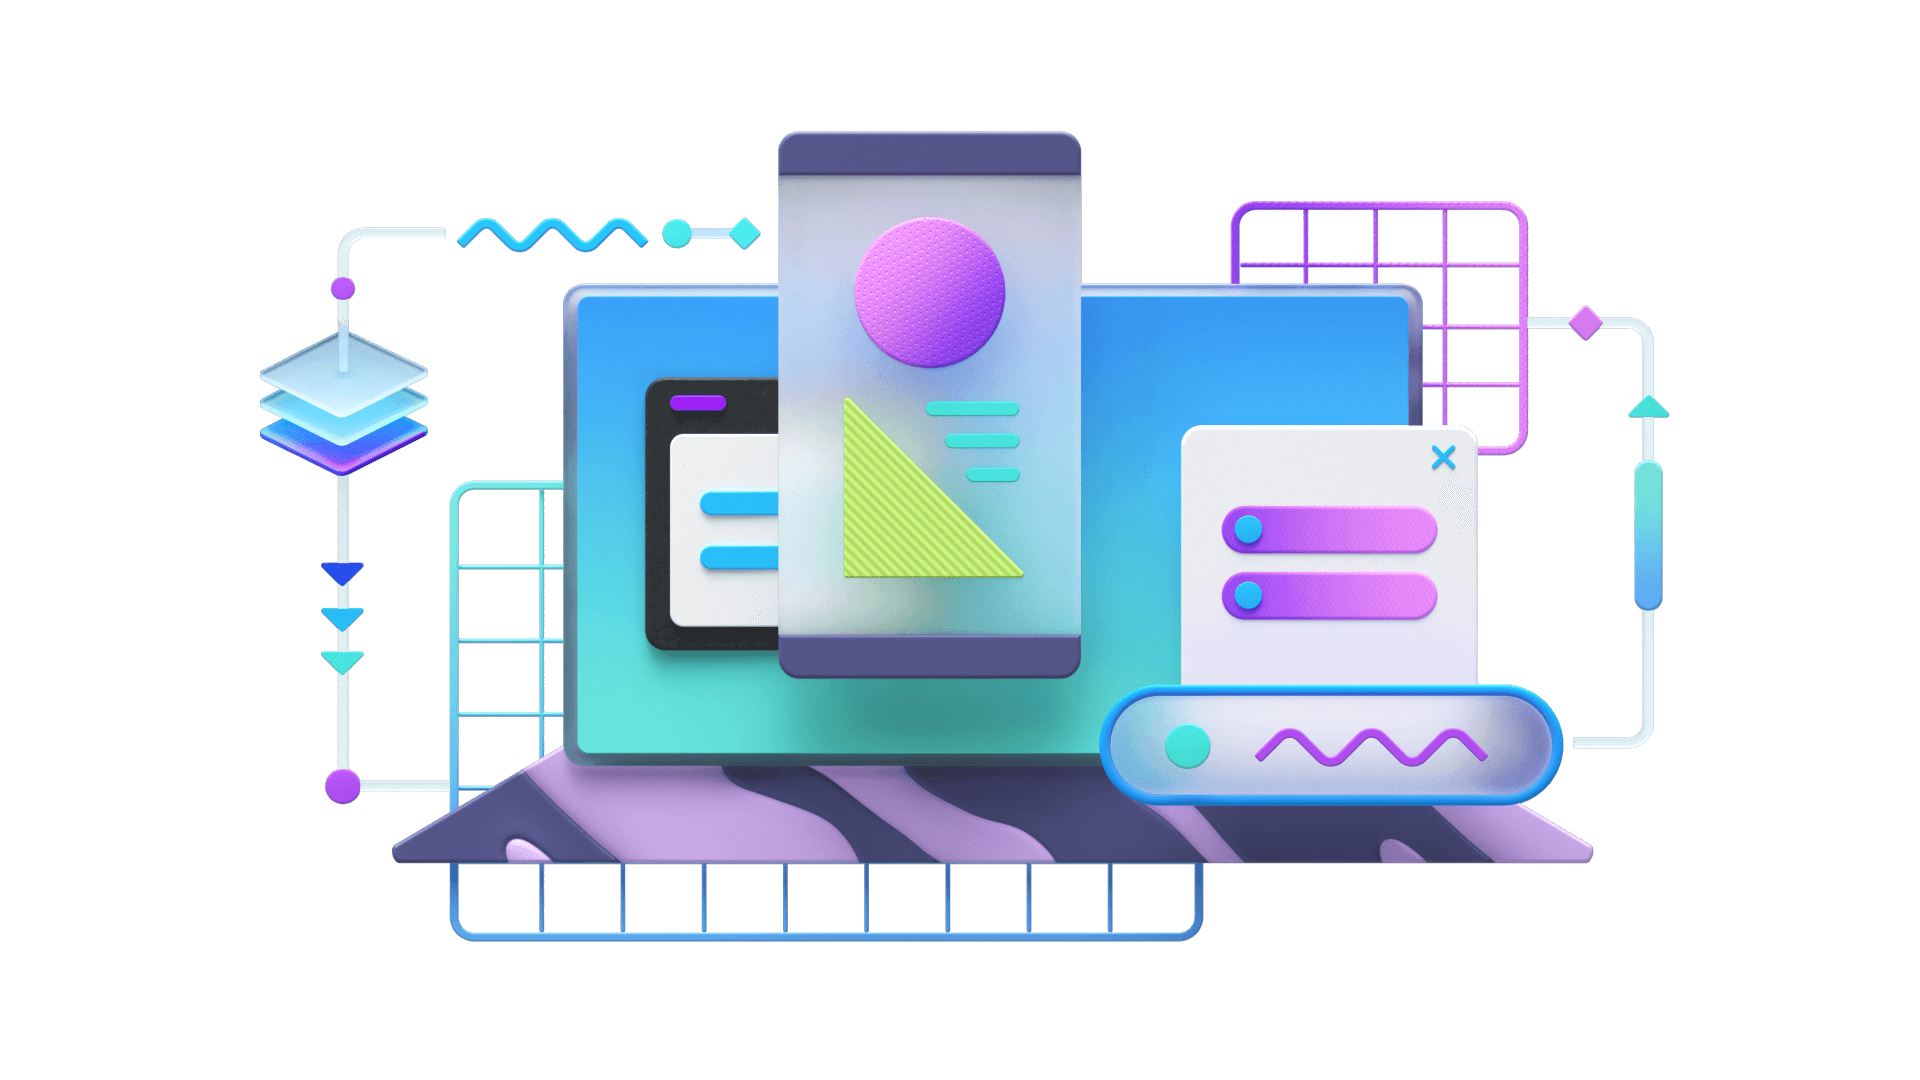 Colorful illustration showcasing Range's technology services